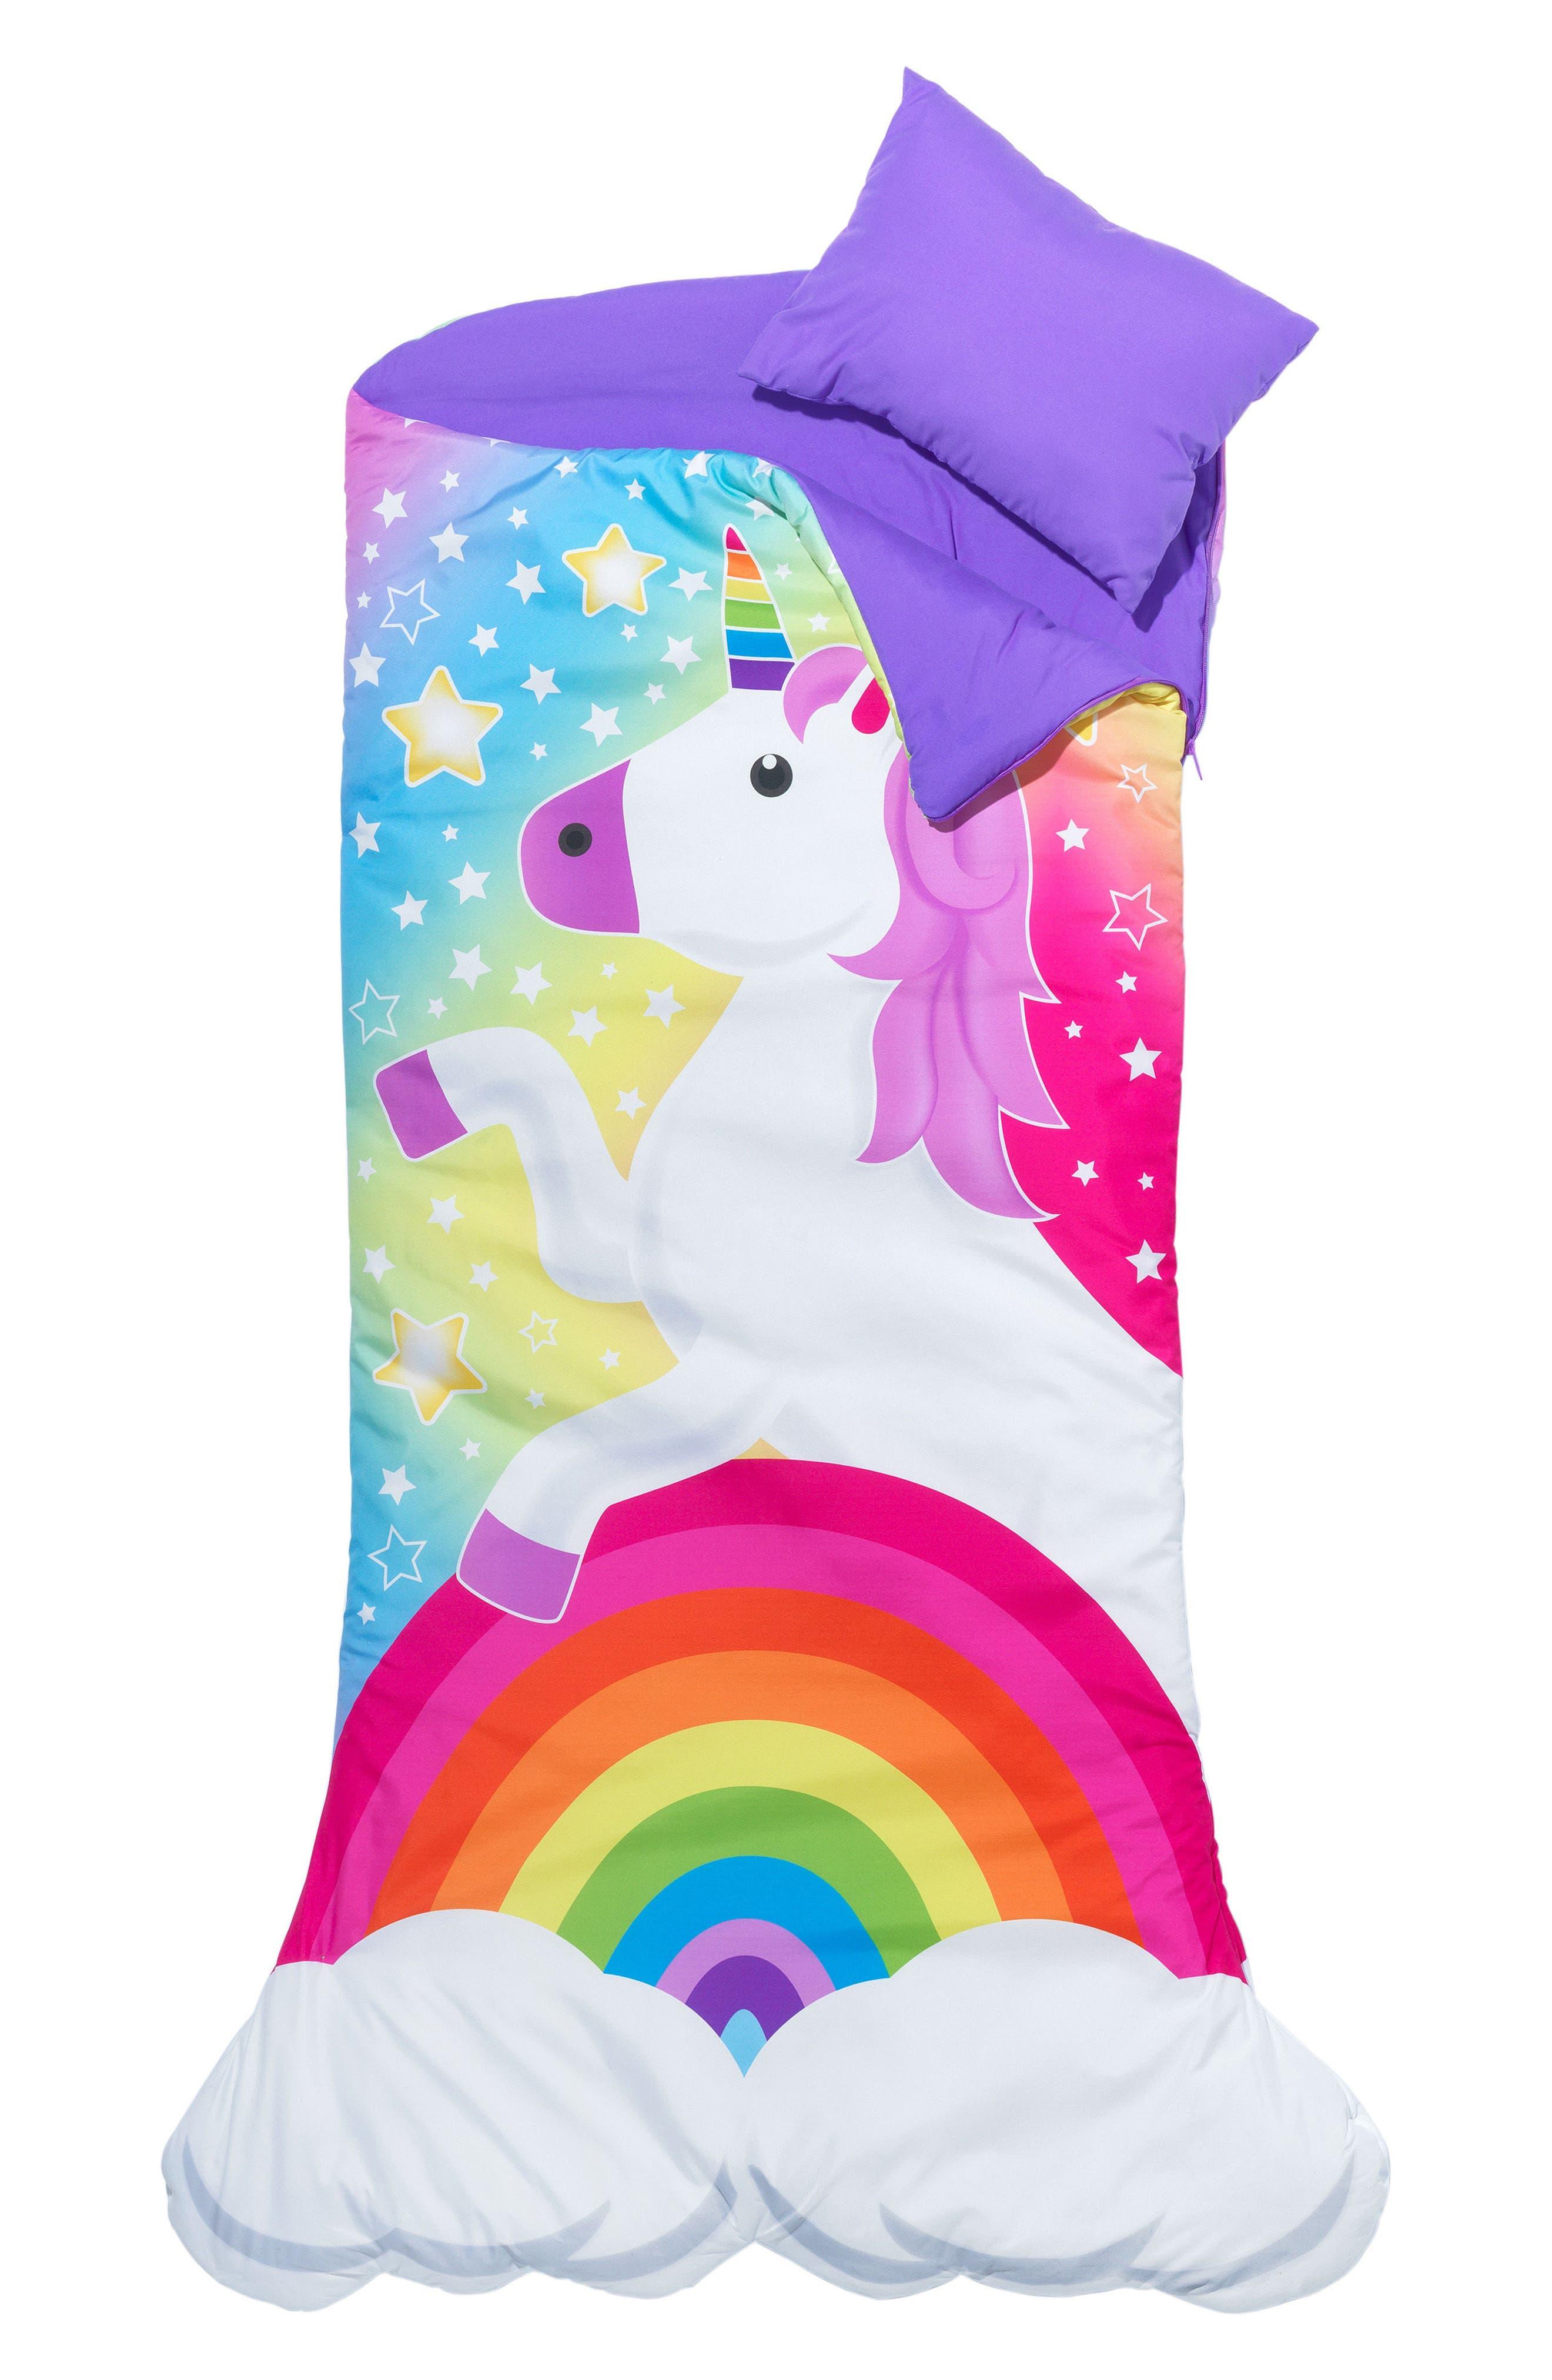 3C4G Unicorn Sleeping Bag Set